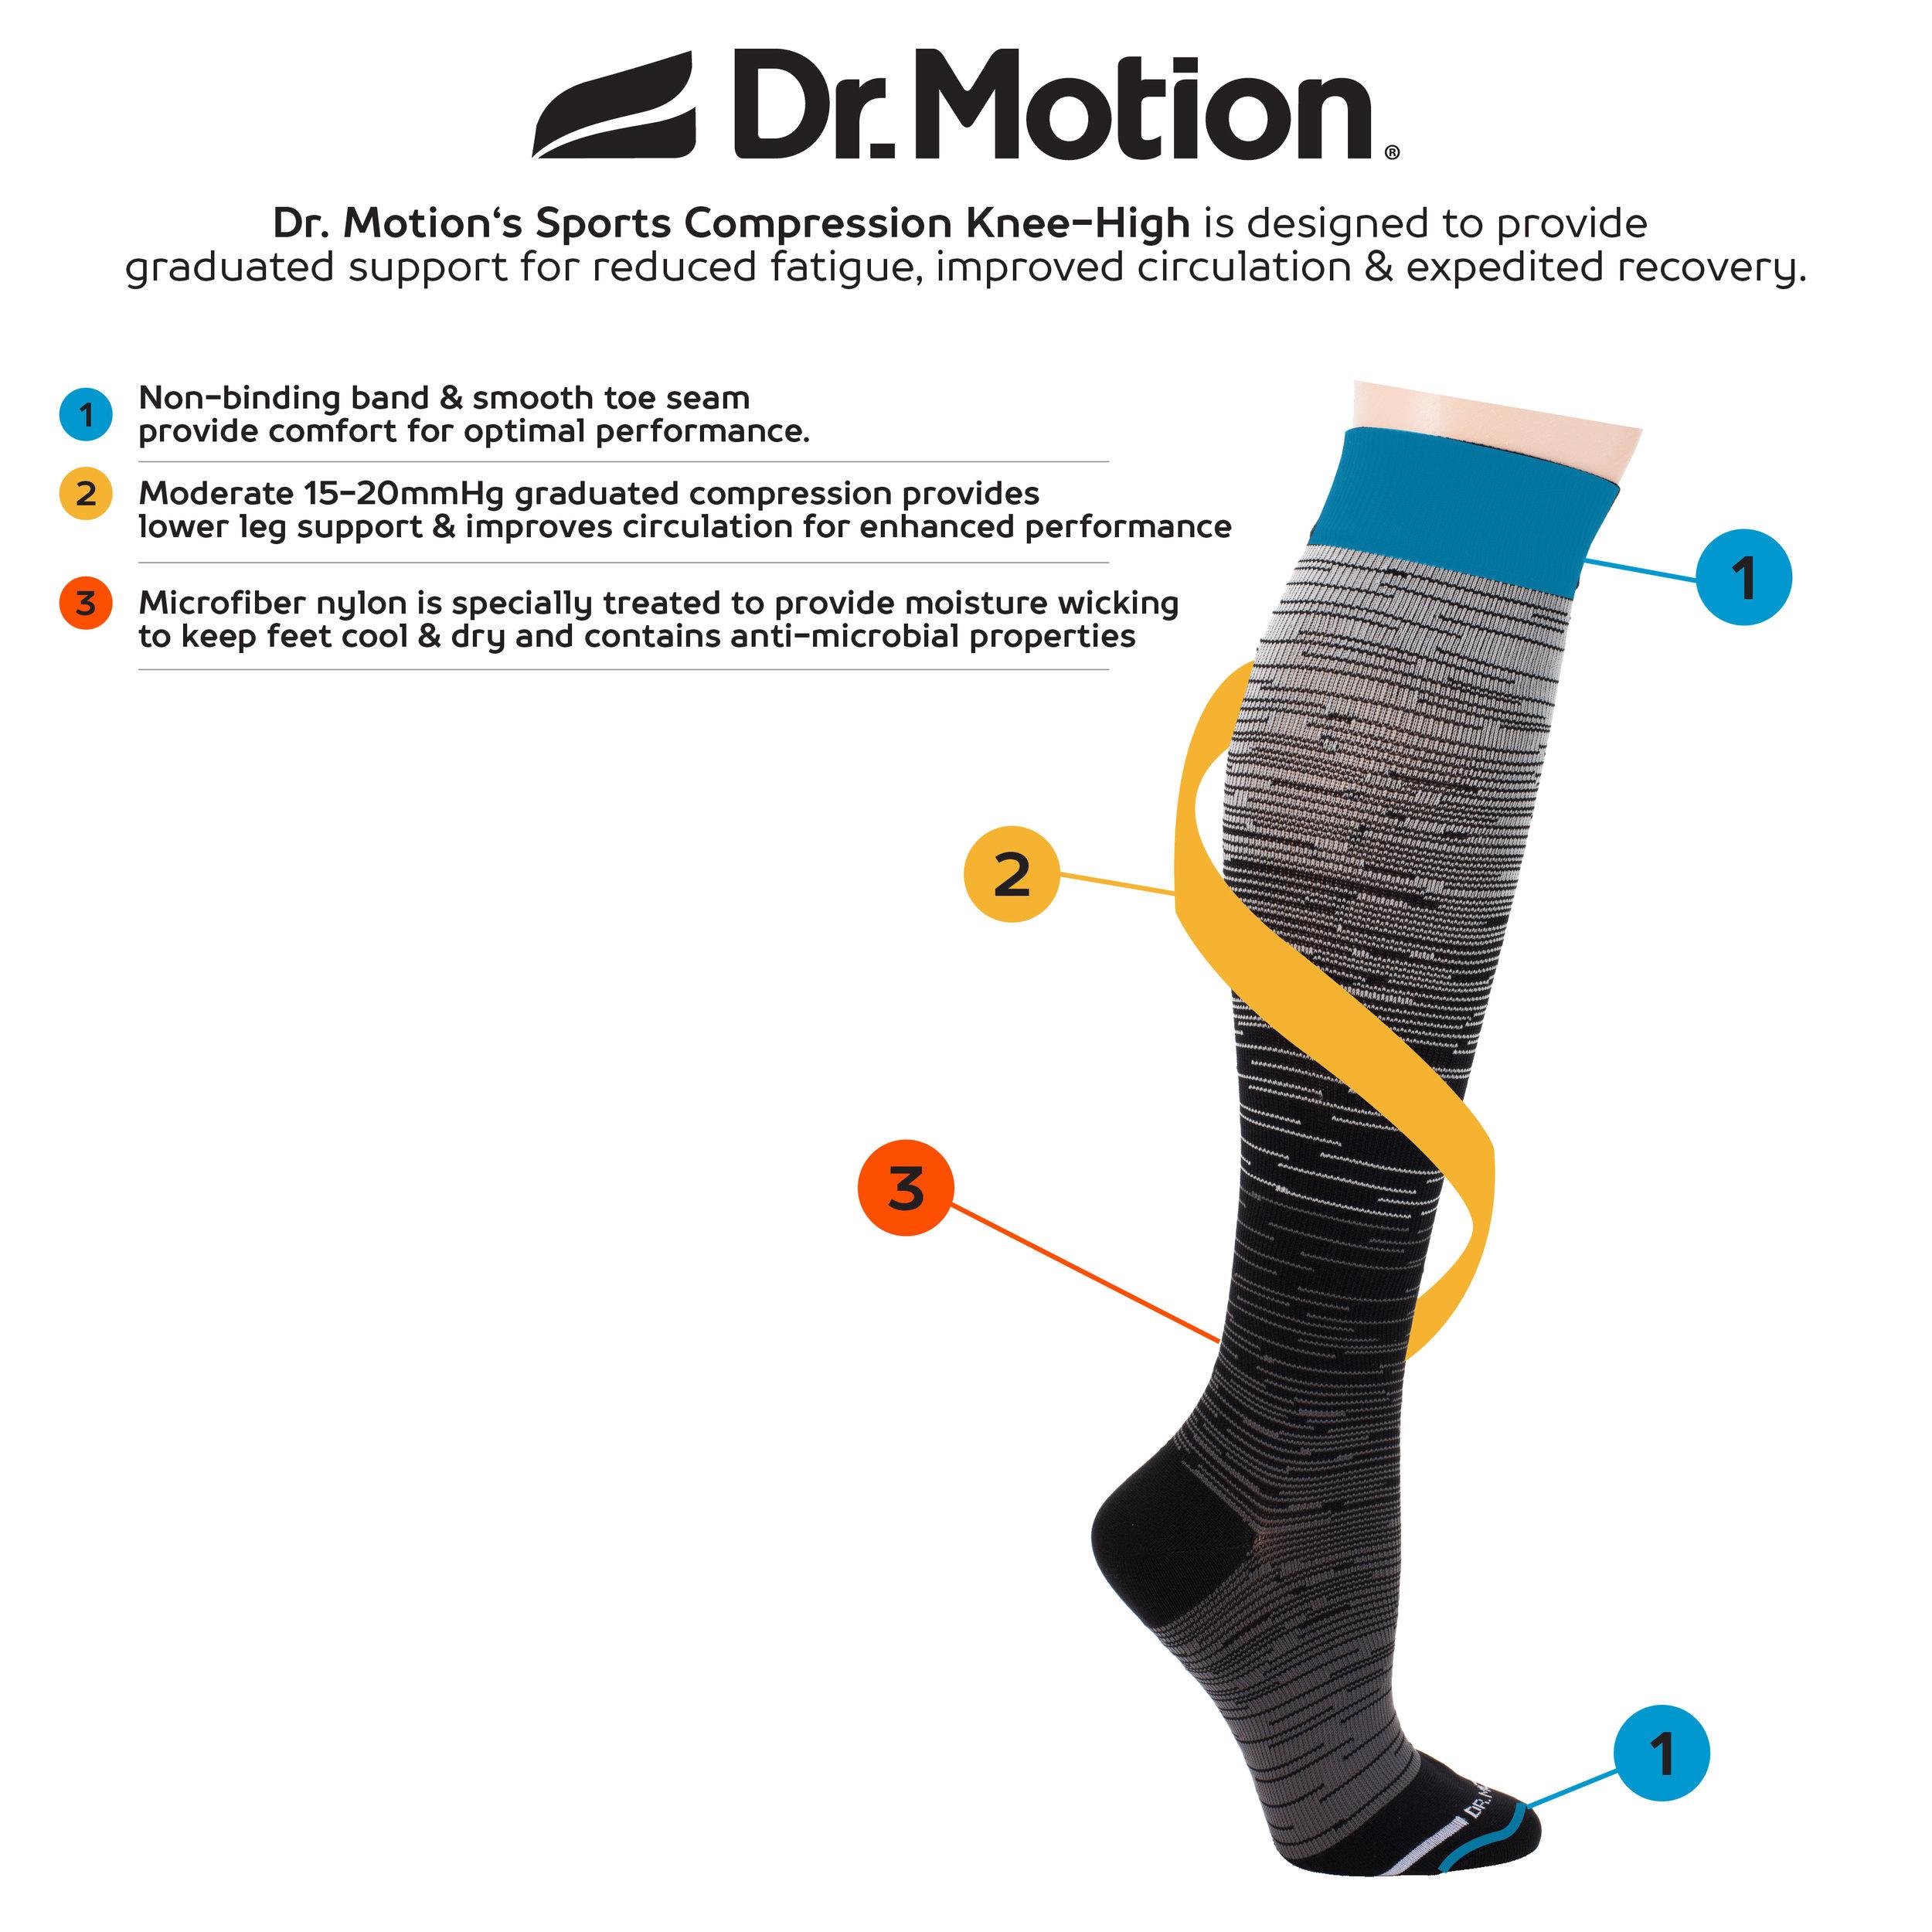 Dr Motion_Sports Compression Knee High.jpg